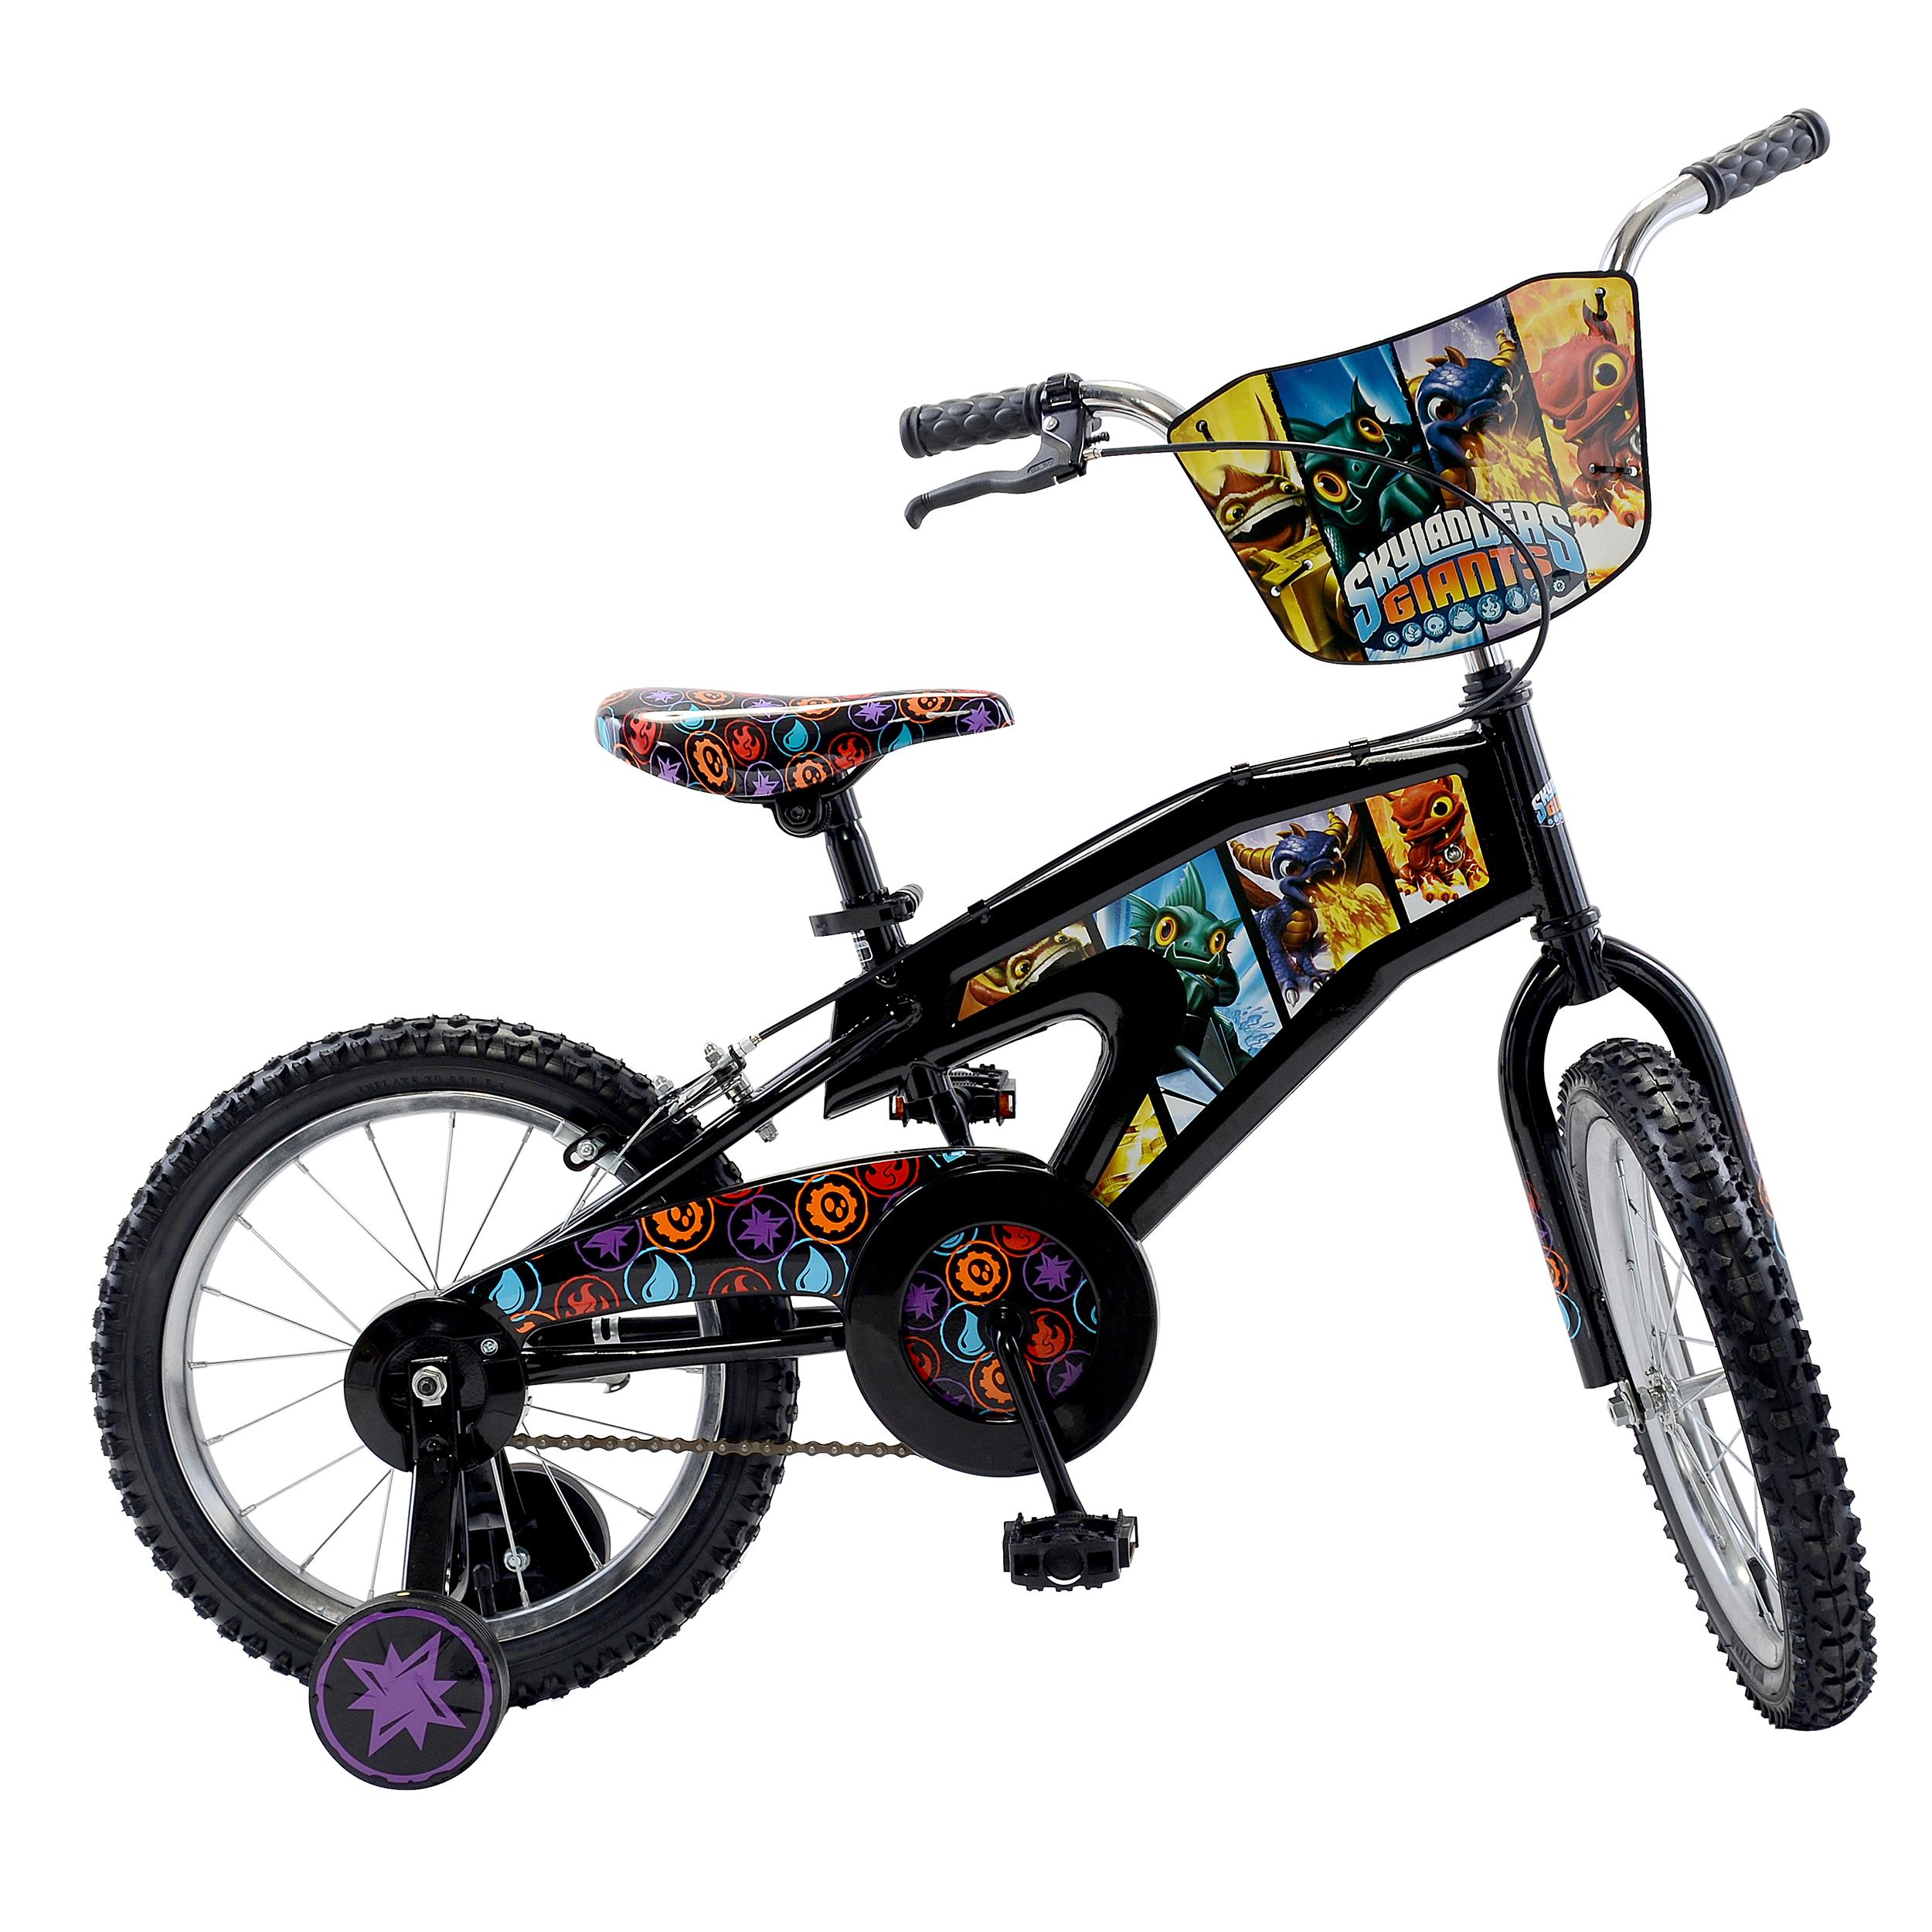 CFG  Skylanders B16 Kids Bicycle PartNumber: 00683414000P KsnValue: 7494846 MfgPartNumber: 6SLBK208TR